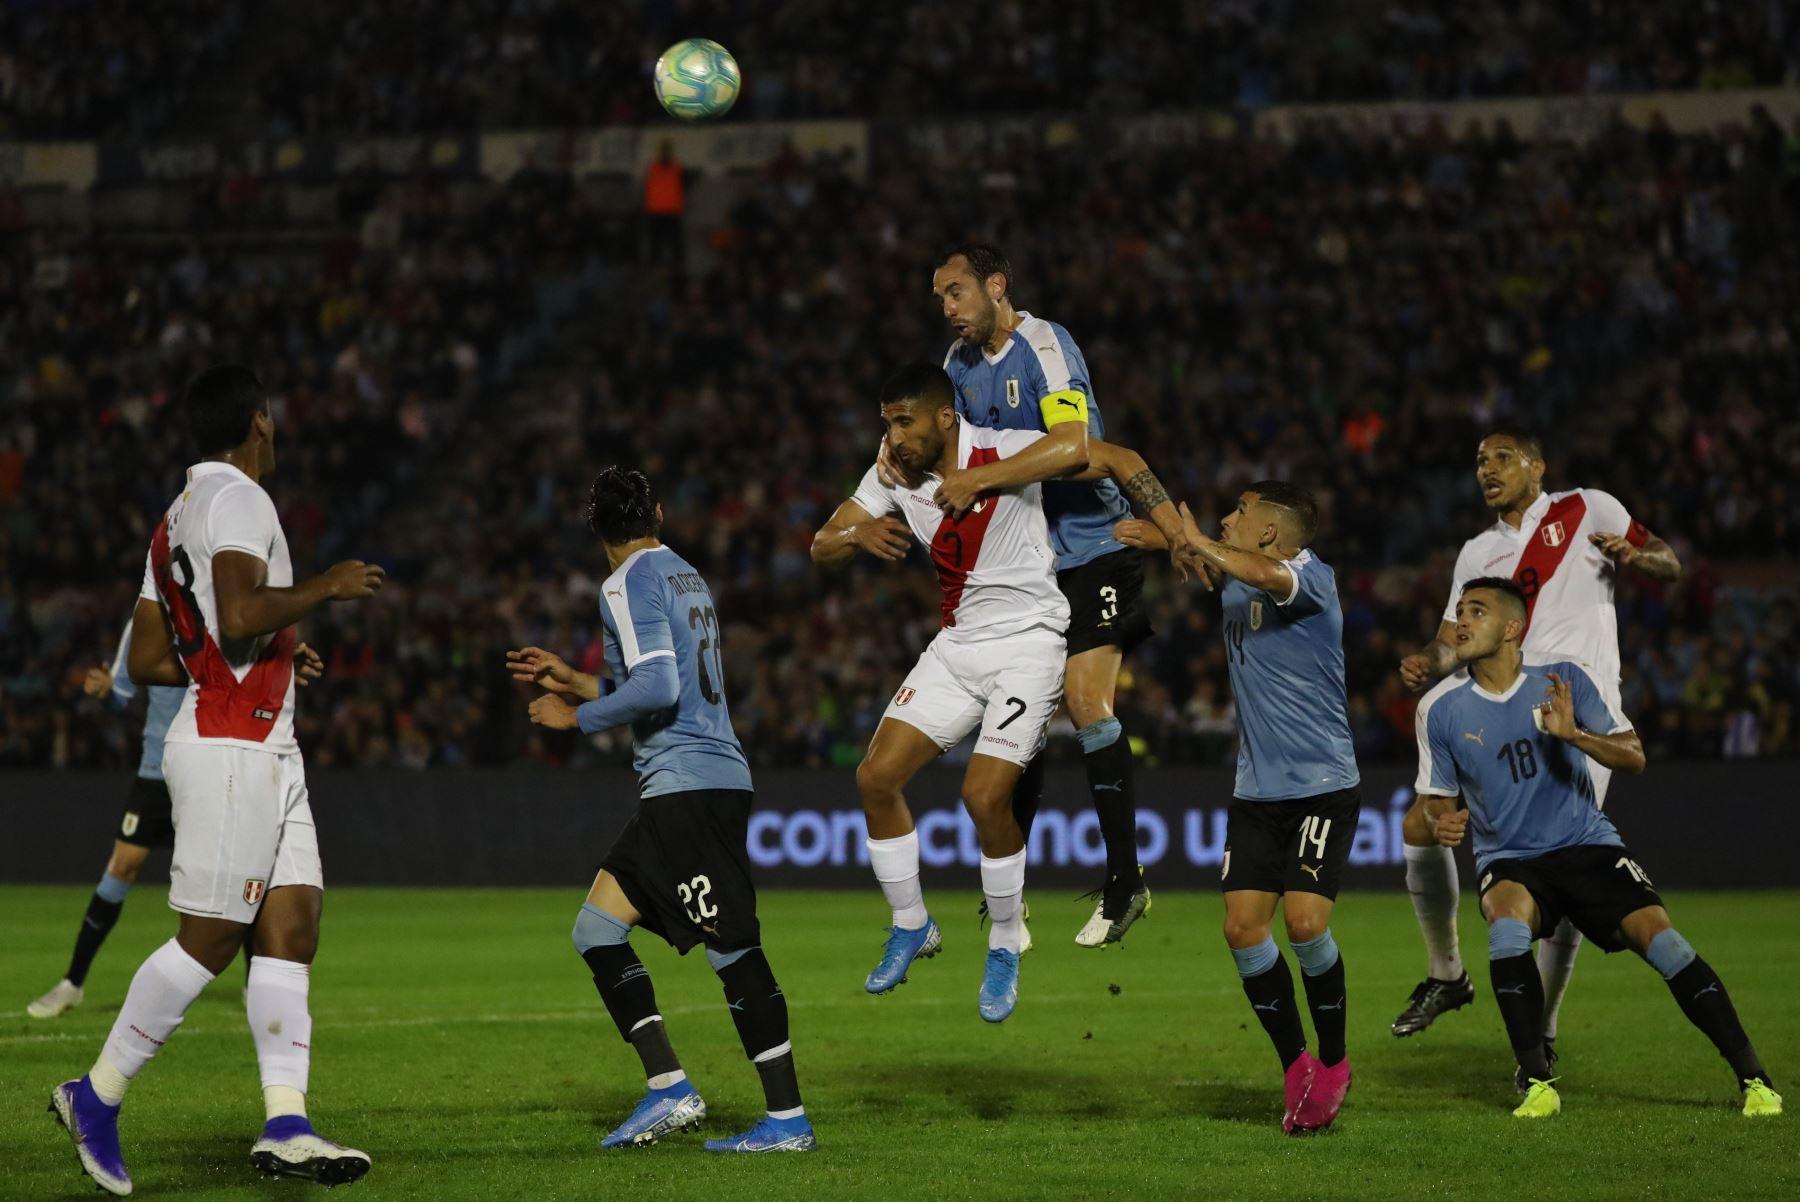 Perú vs. Uruguay se enfrentan en amistoso. Foto: EFE